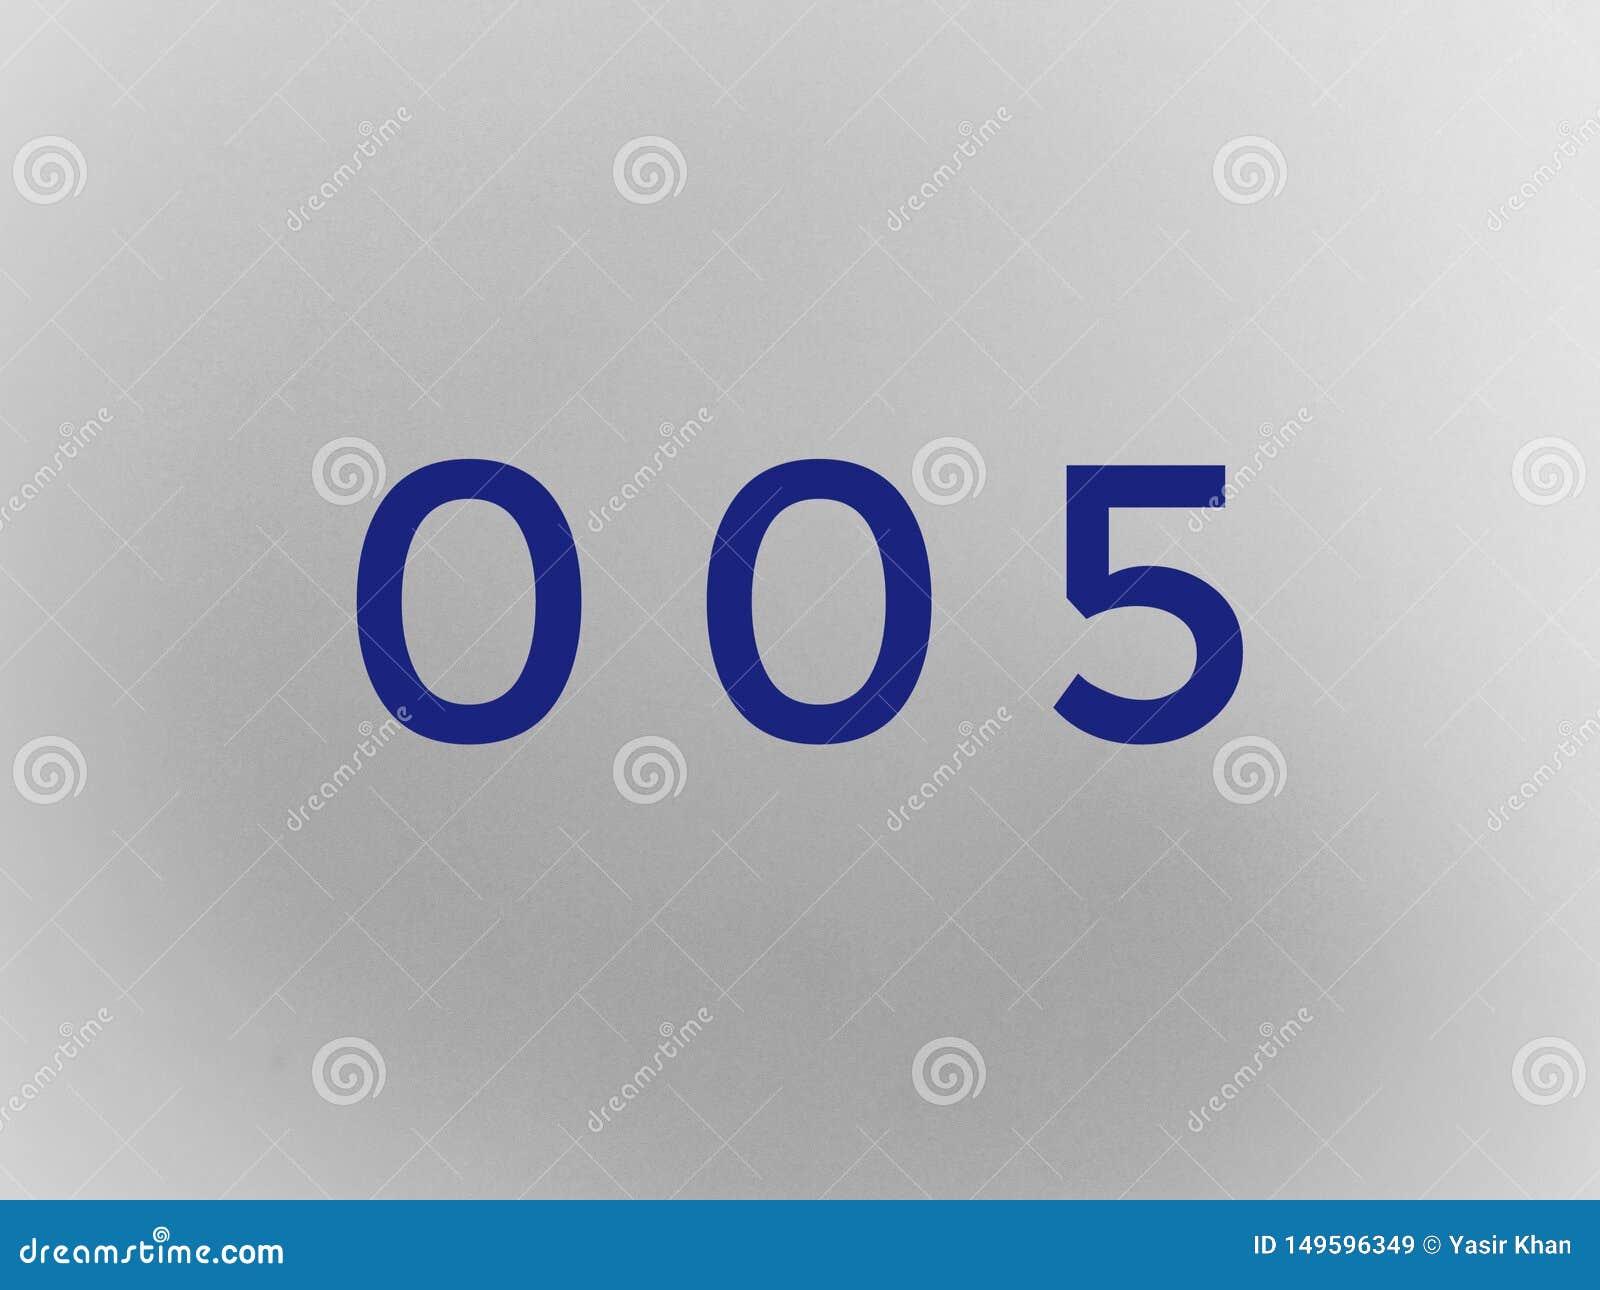 Zero zero one number digit maths font letter